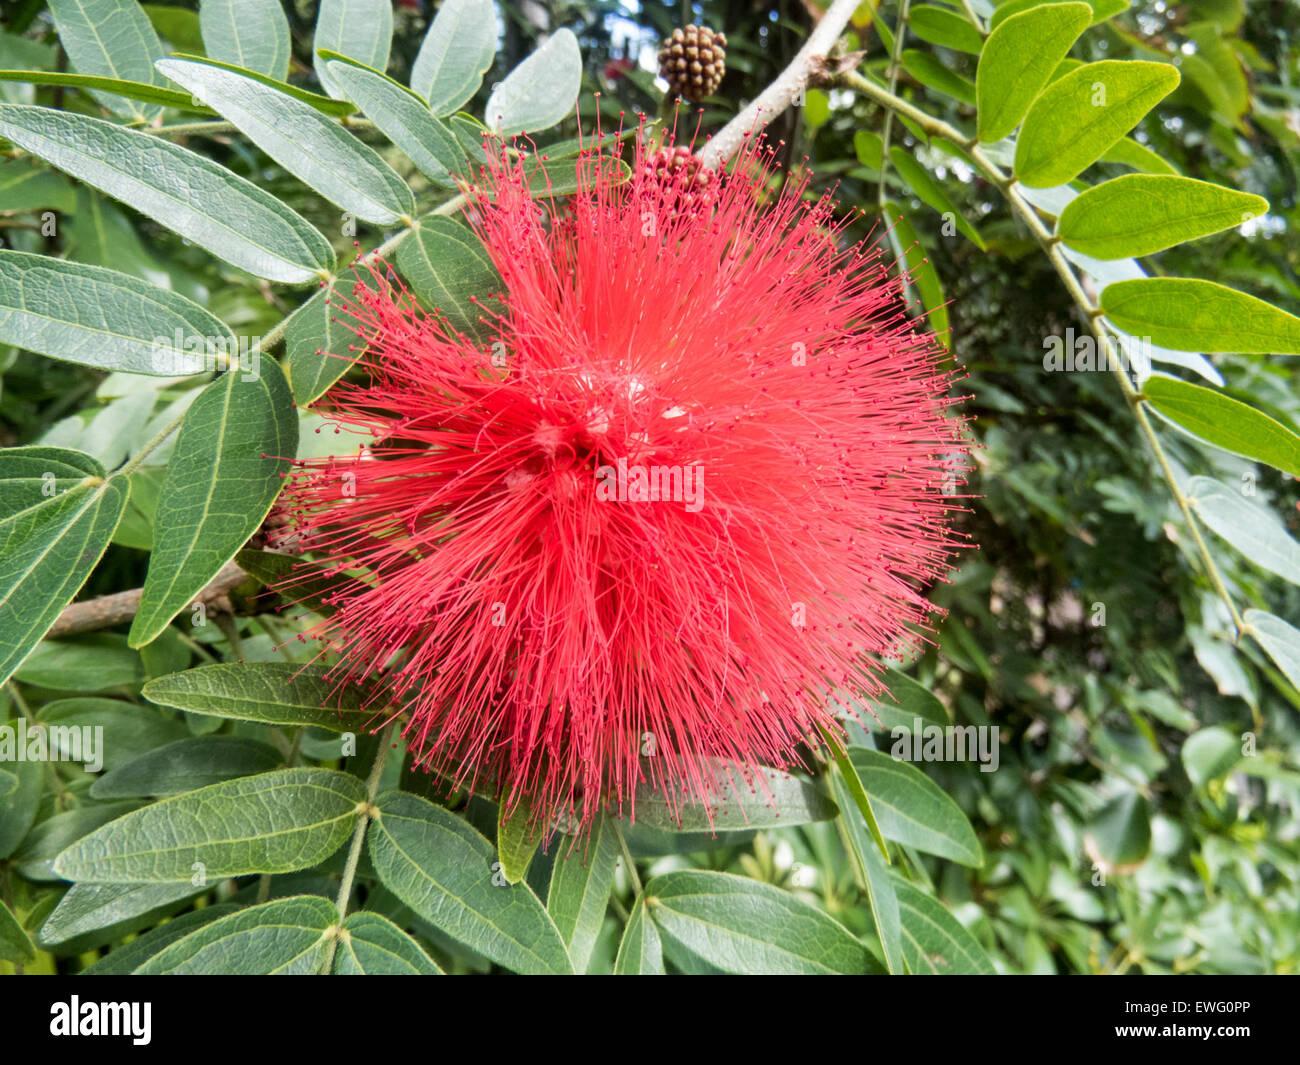 Flor roja difusa en planta verde Imagen De Stock